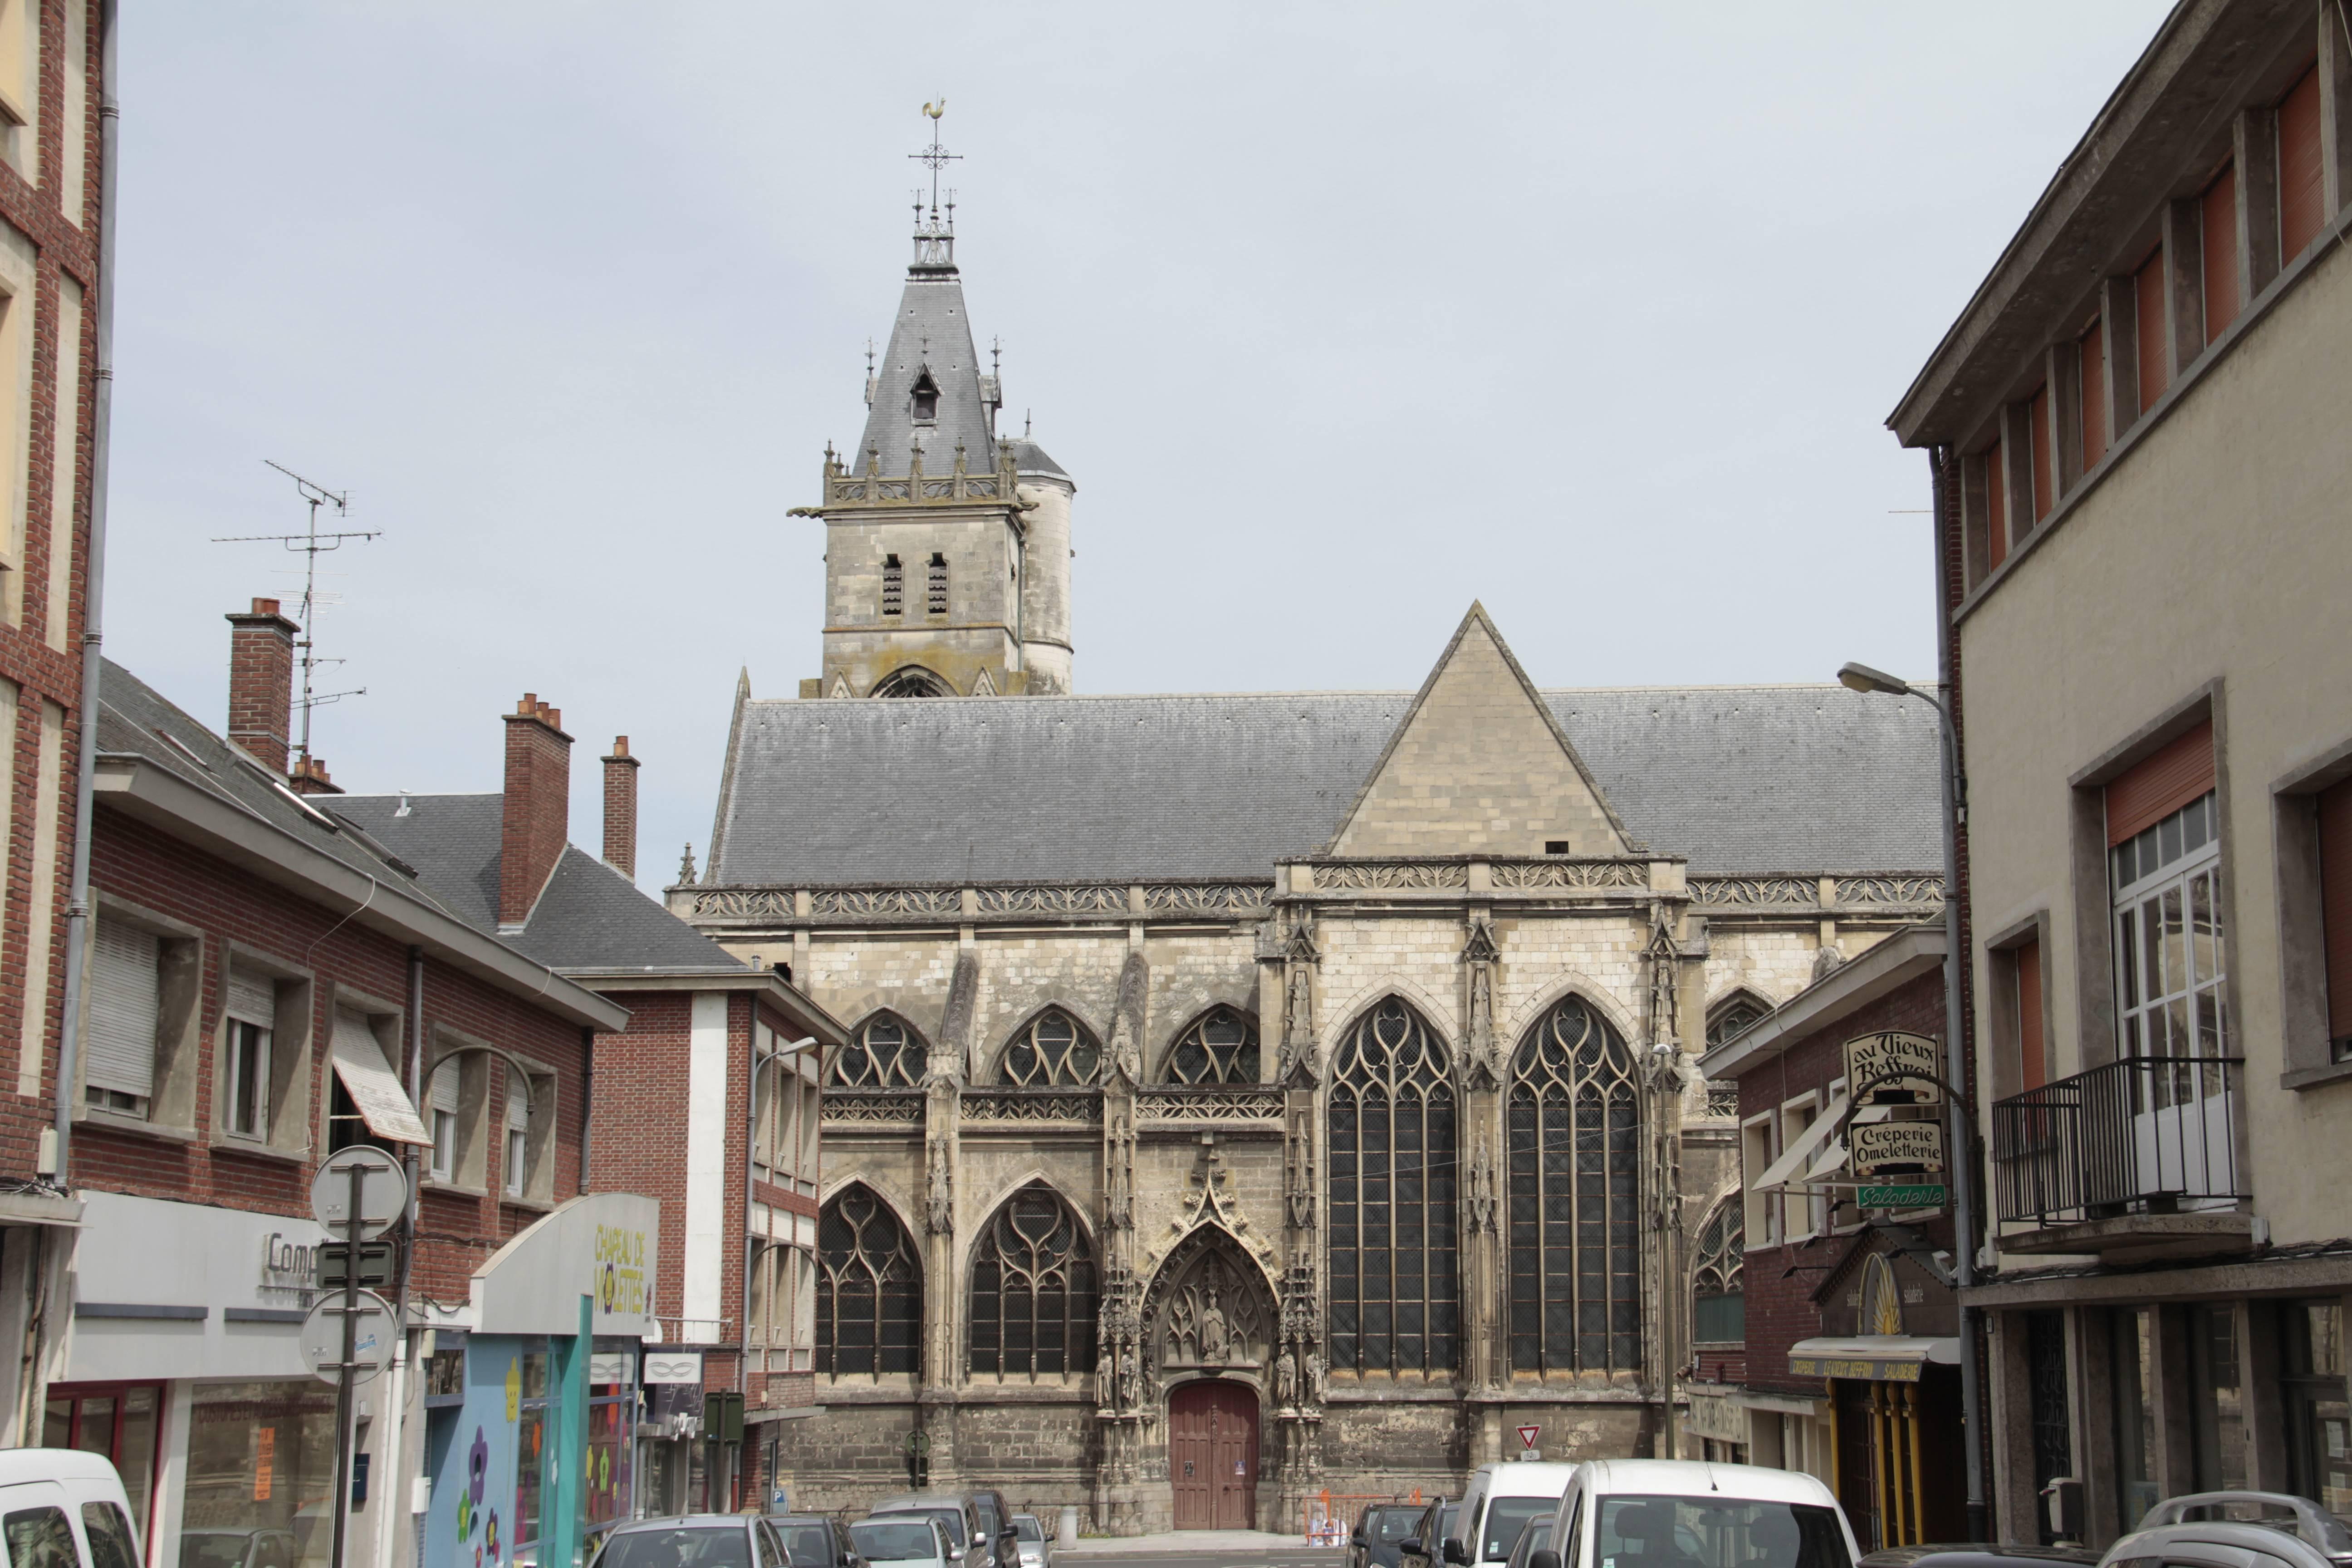 Baie de Somme mai 2015_0028 Amiens Eglise St Germain